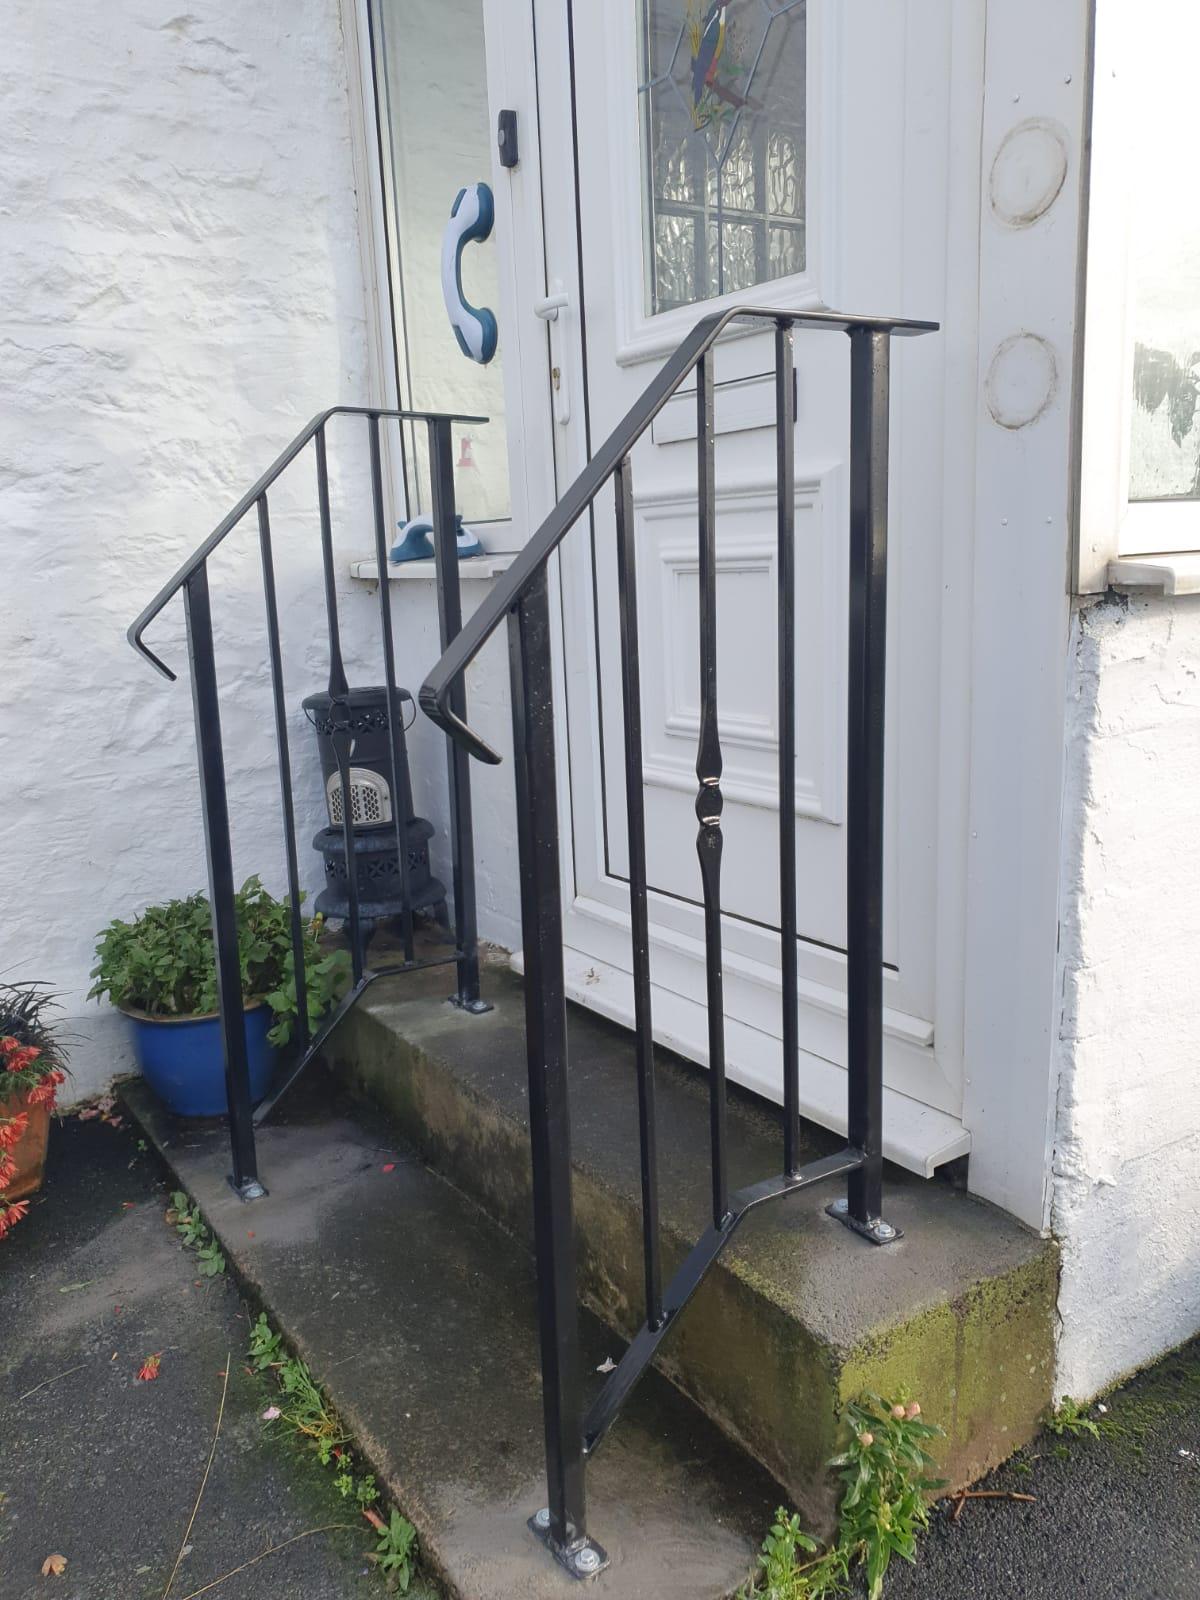 Custom made decorative metal handrails by Dain Art Iron, Ayrshire Scotland